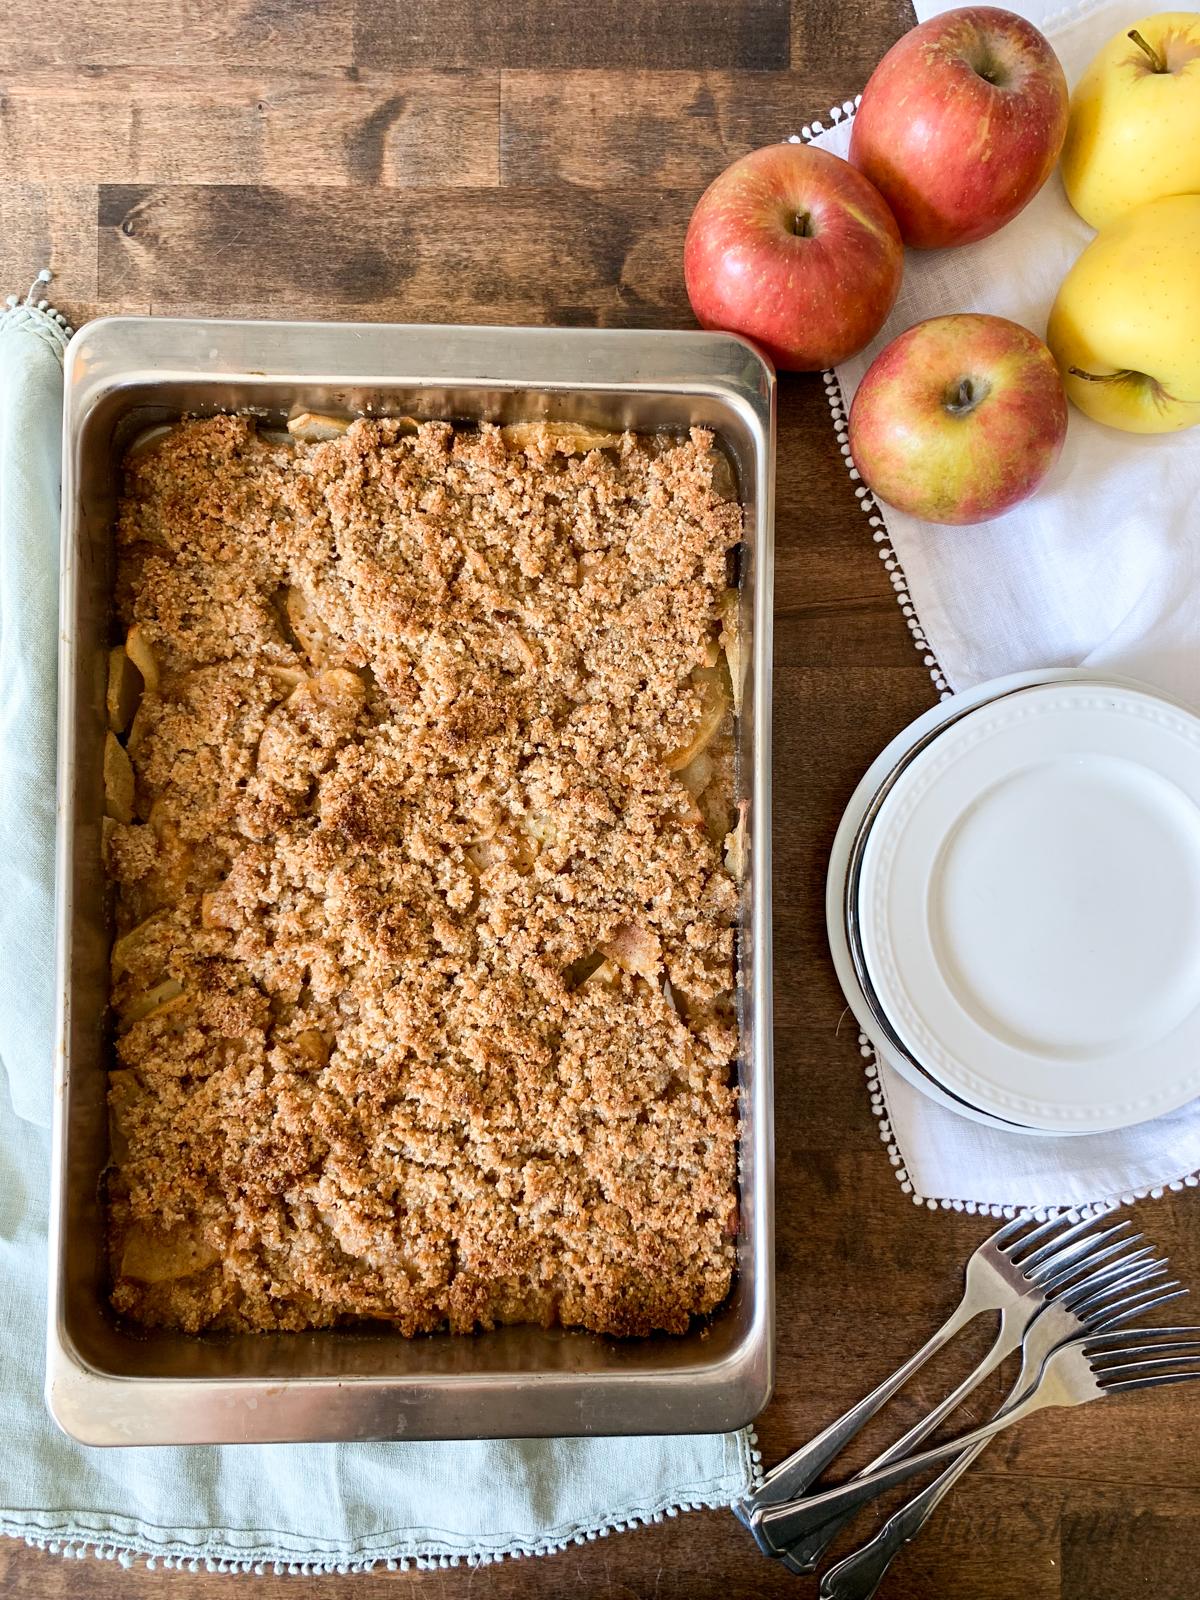 A pan of easy to make grain-free apple crisp